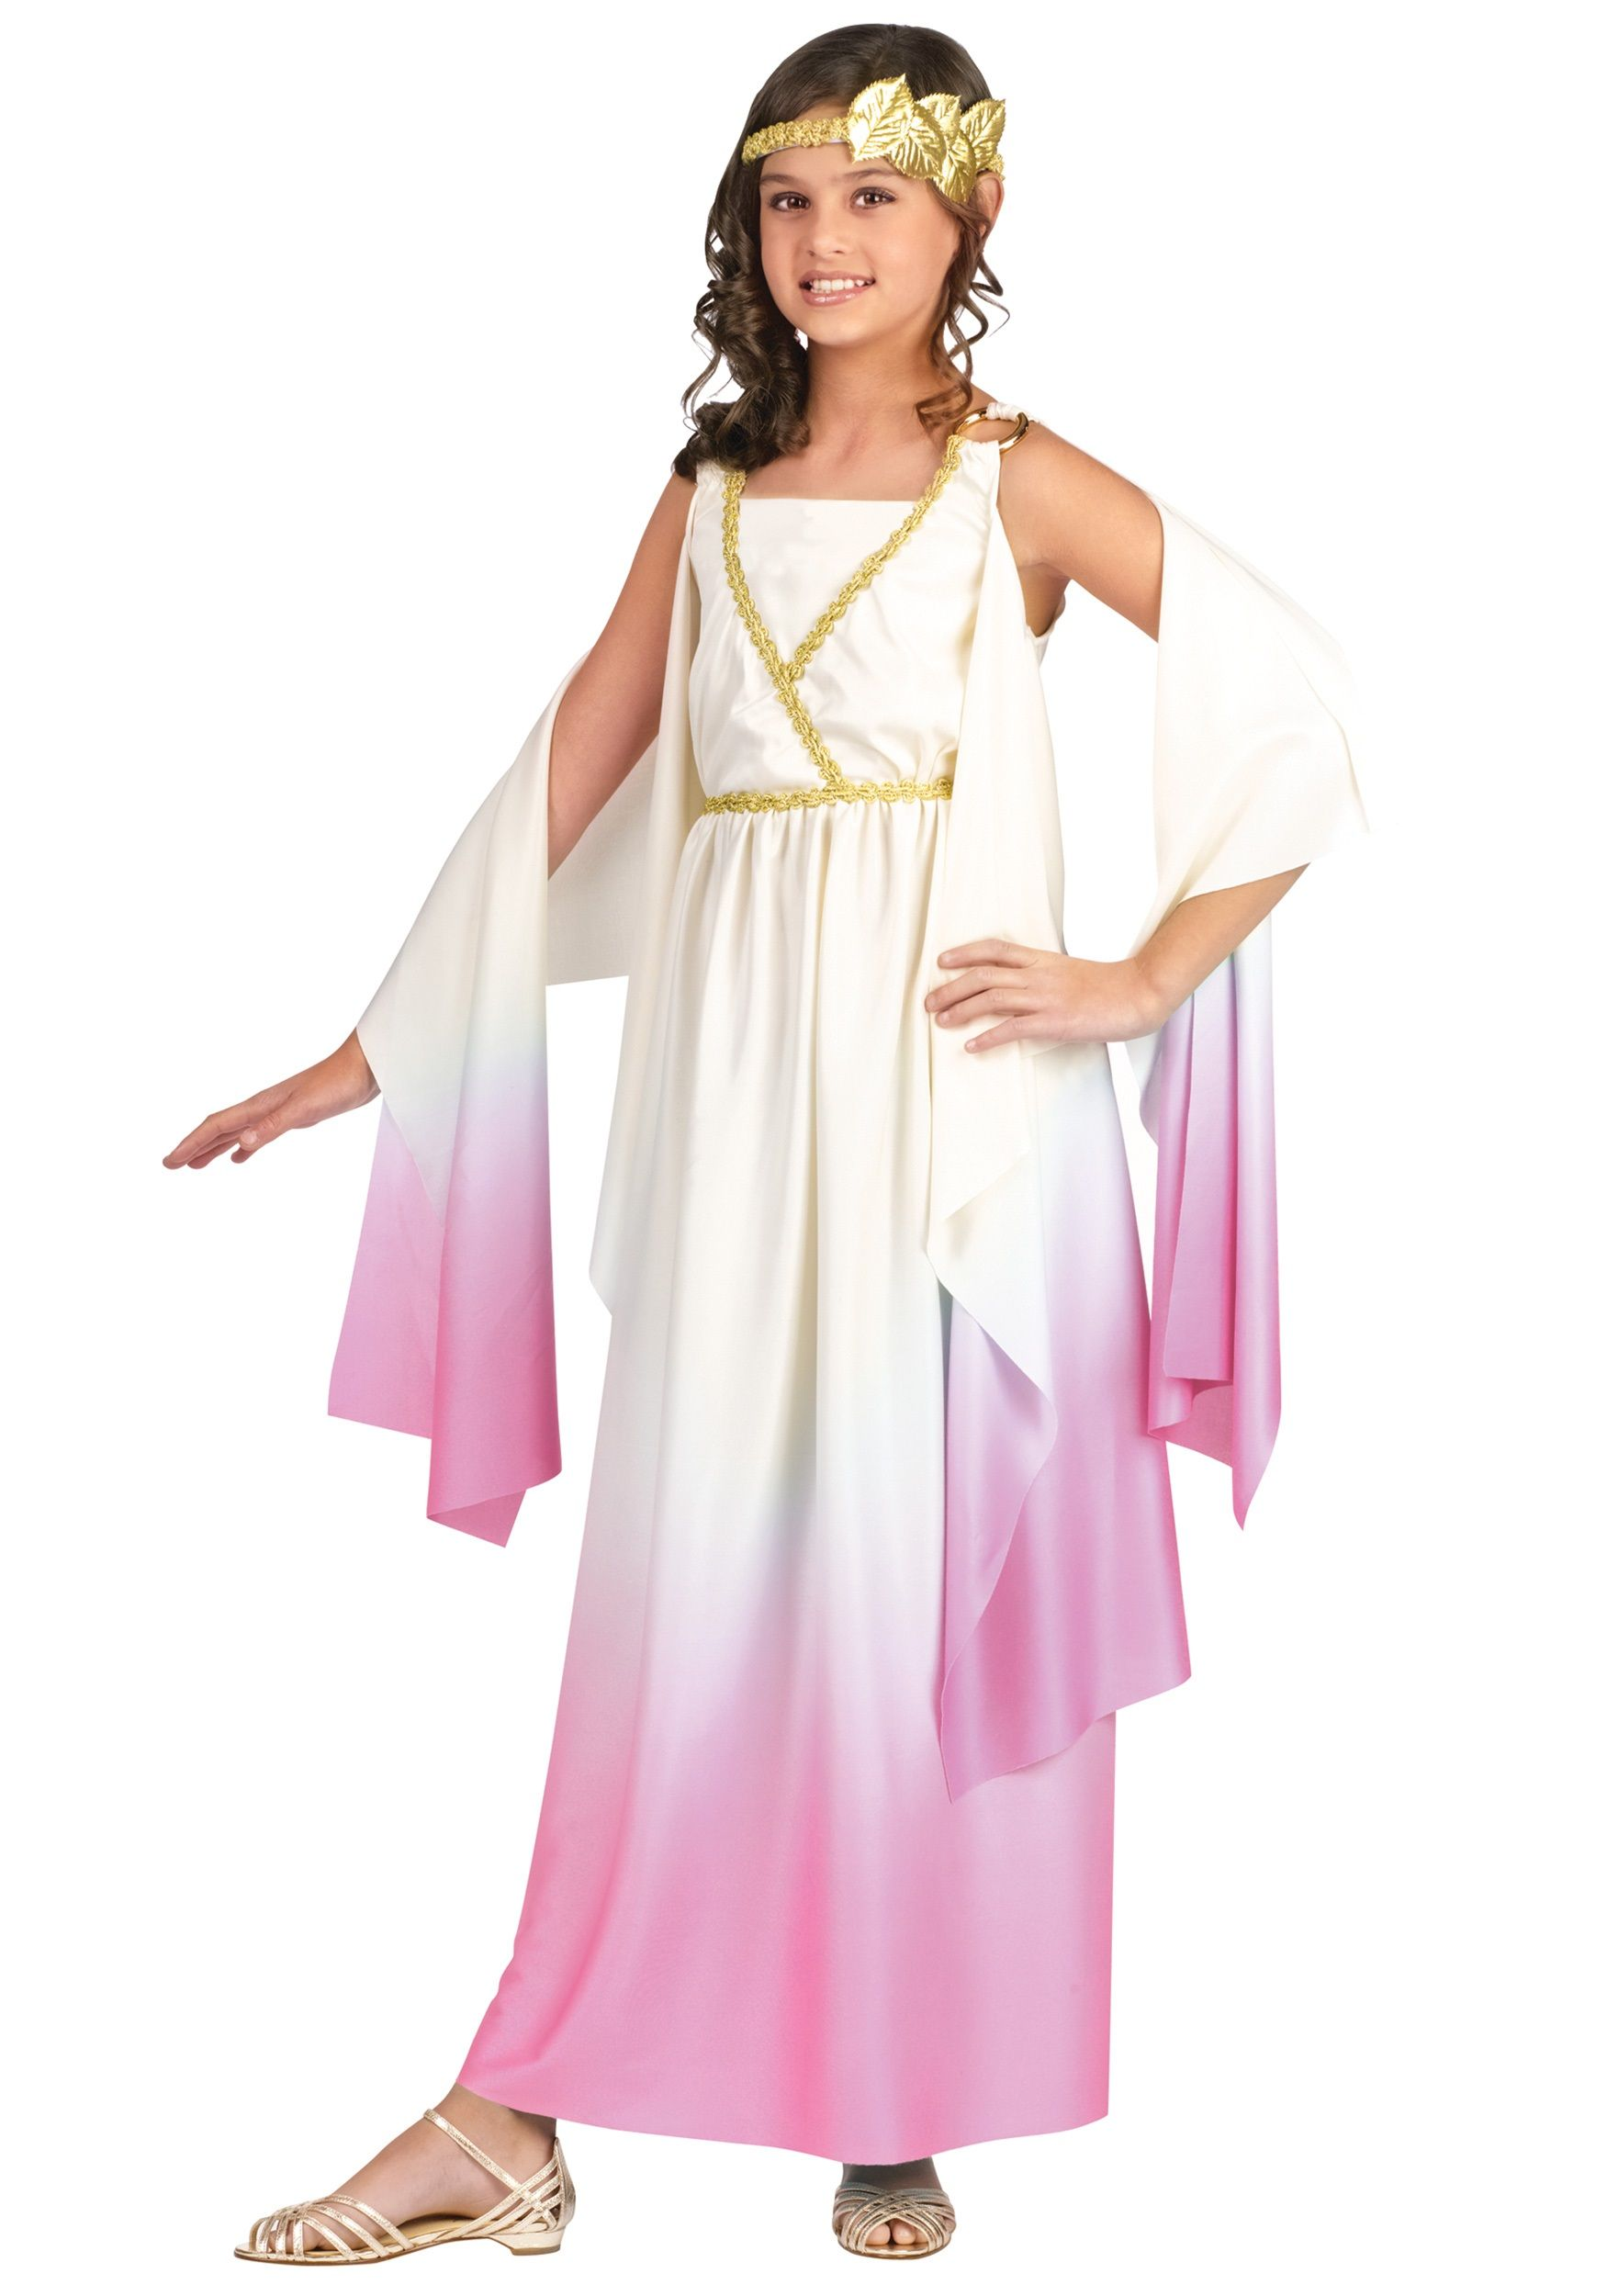 Child Athena Goddess Costume  sc 1 st  Pinterest & Child Athena Goddess Costume | Halloween Costumes | Pinterest ...